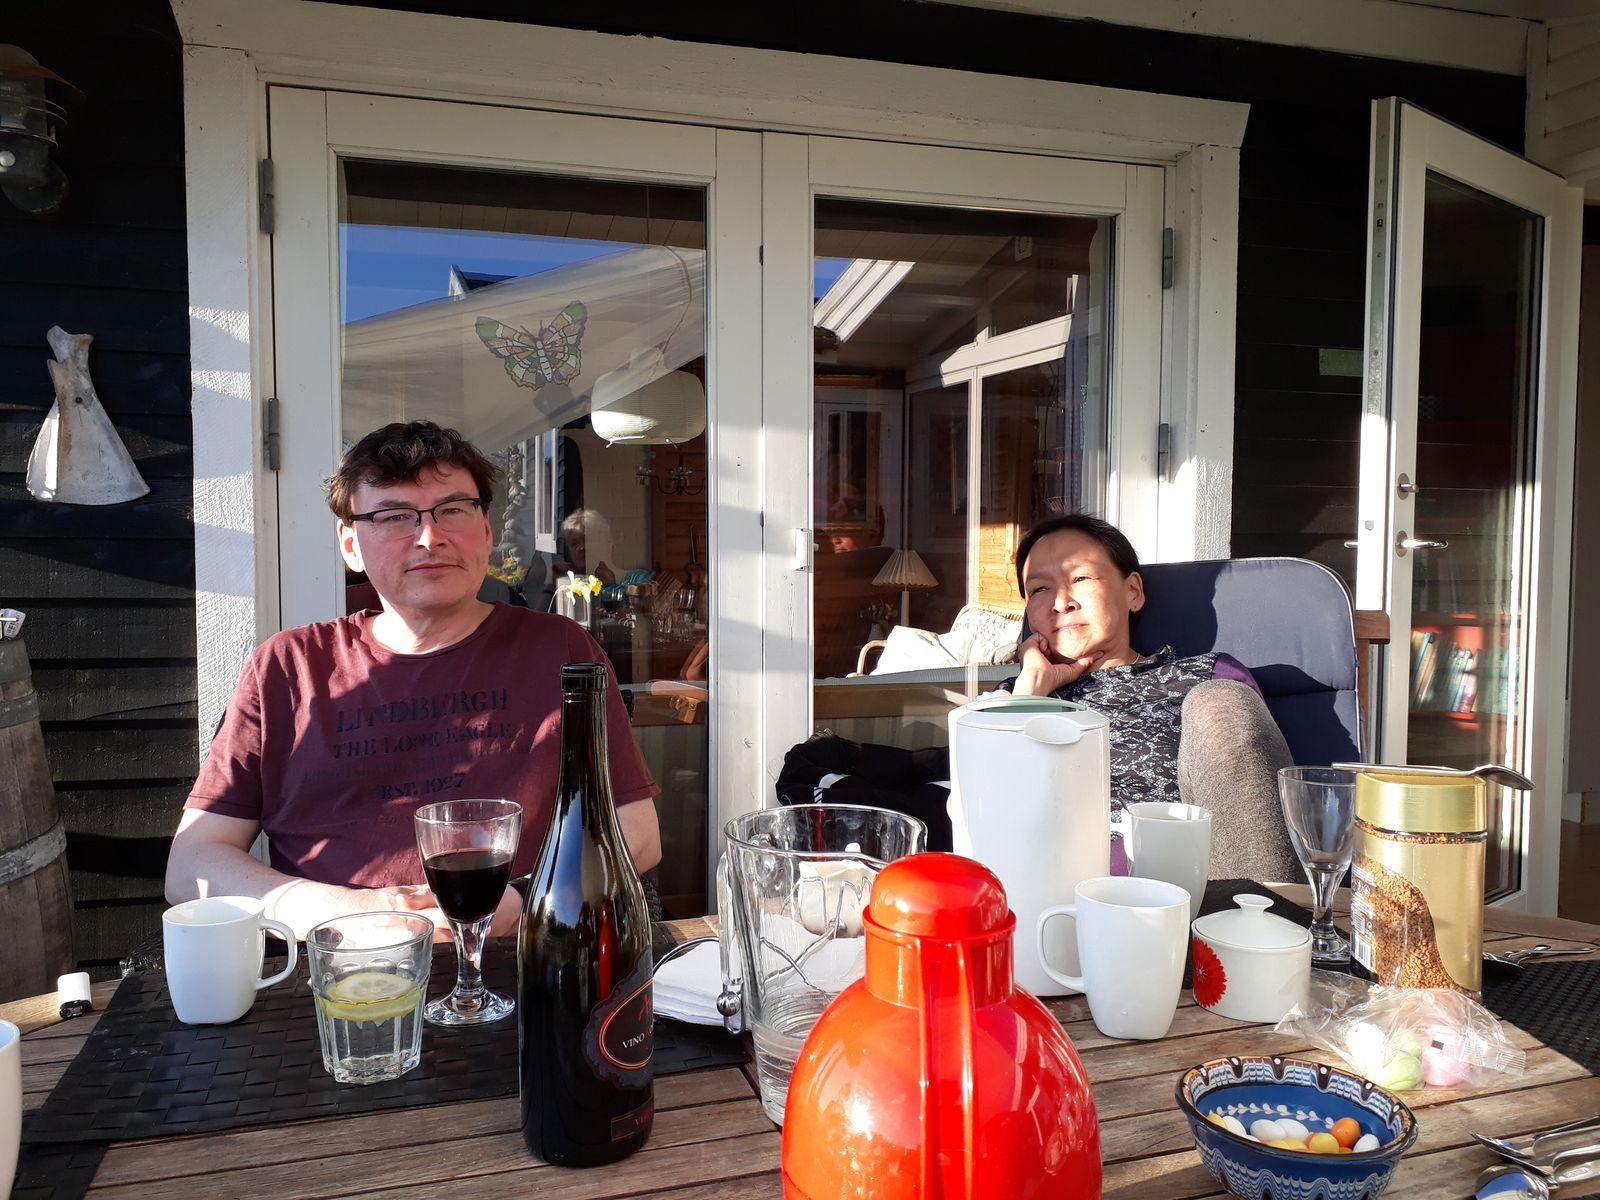 Middag og hygge i Ekko